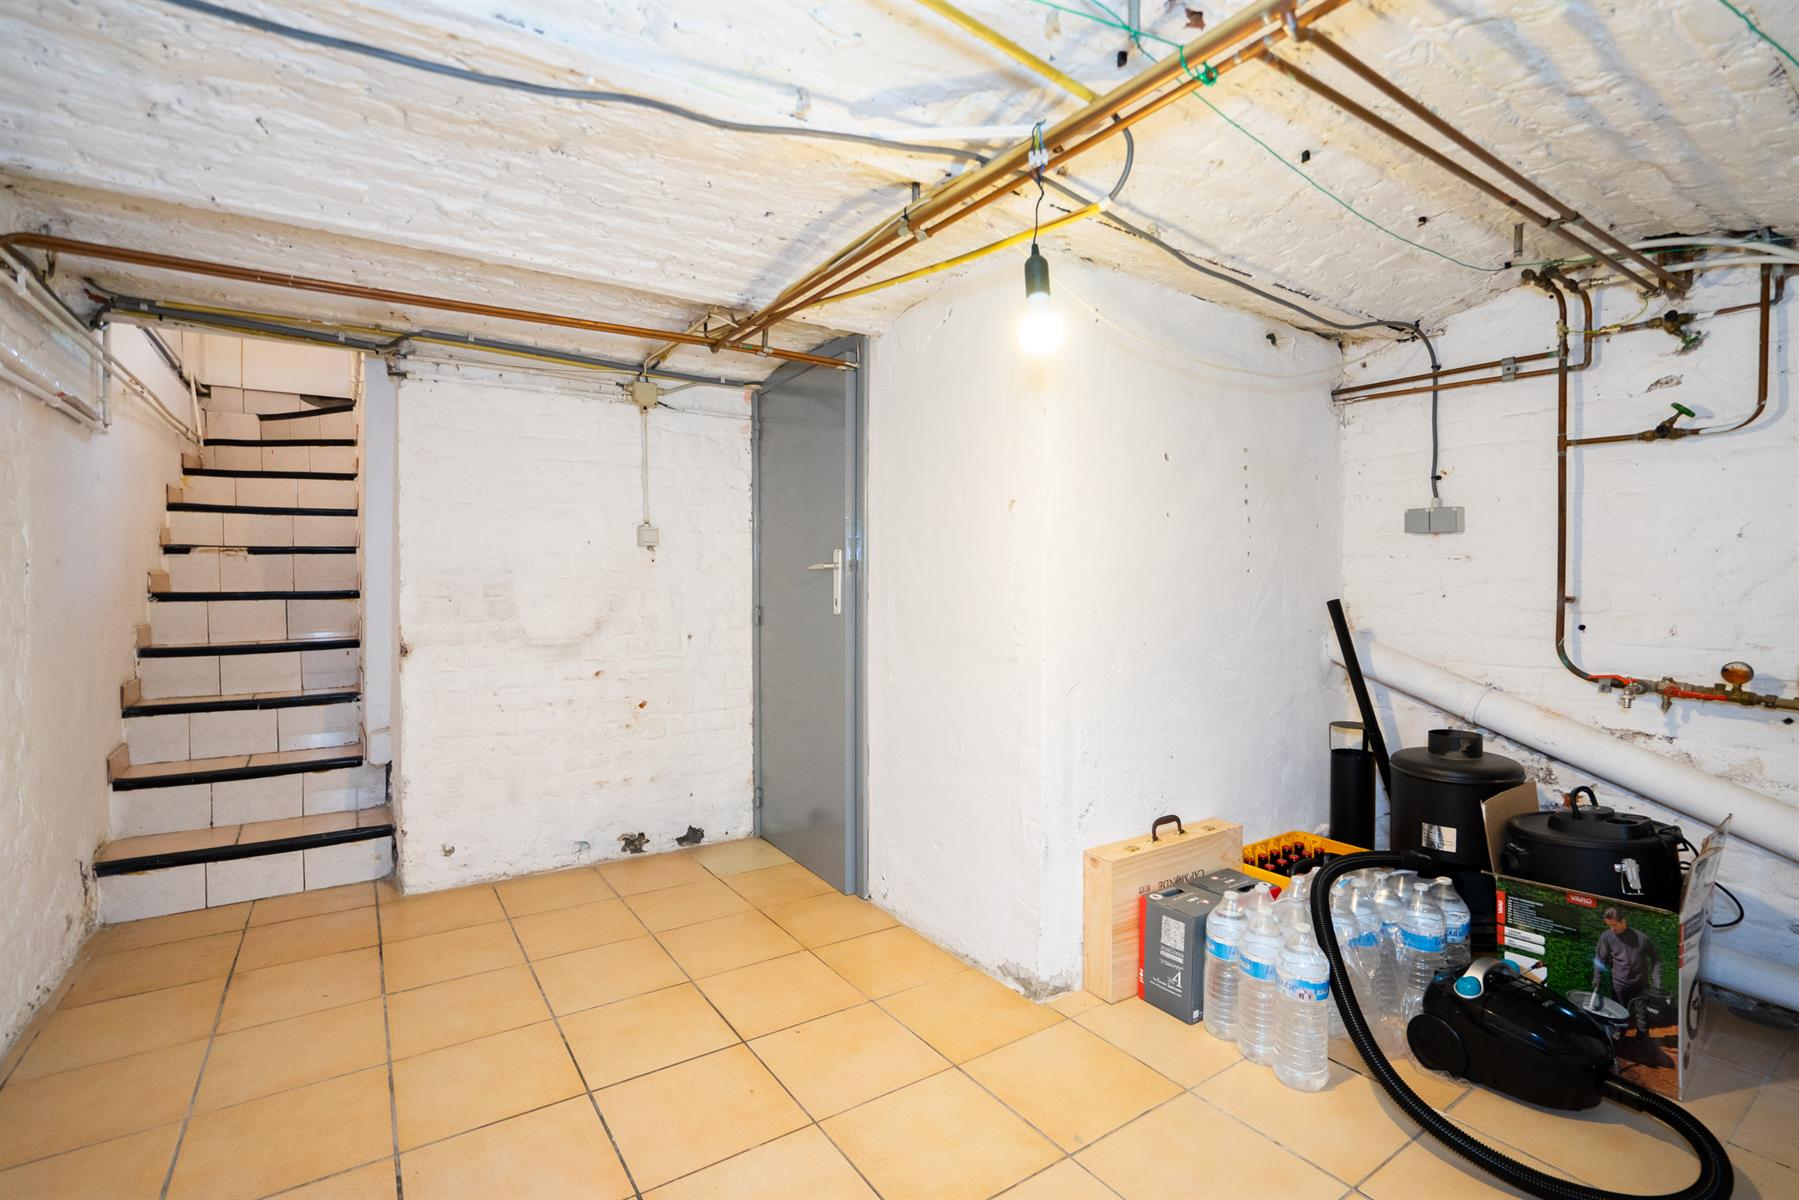 Maison - Beyne-Heusay Bellaire - #4422118-18